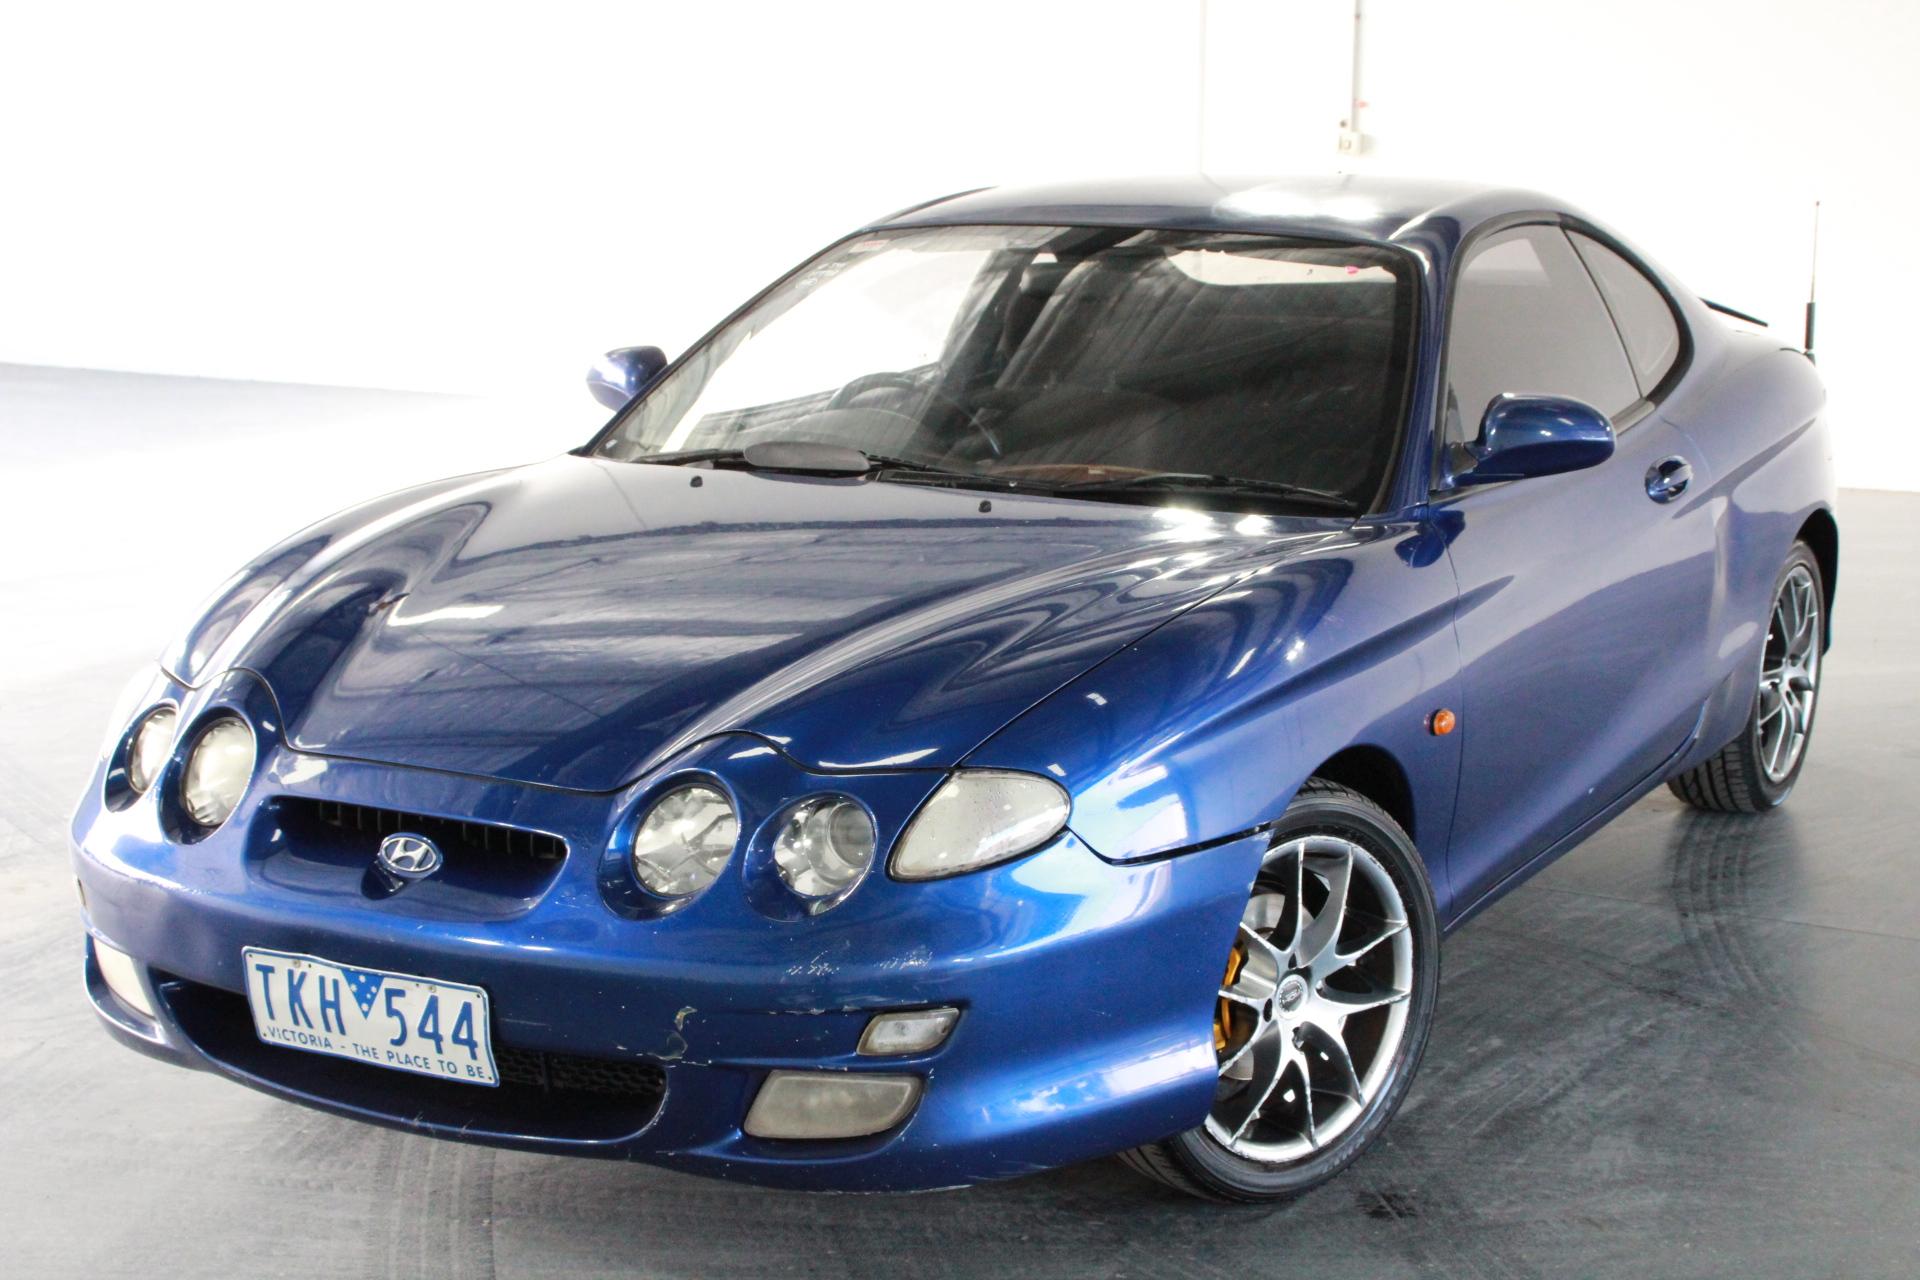 2000 Hyundai COUPE FX RD Manual Coupe